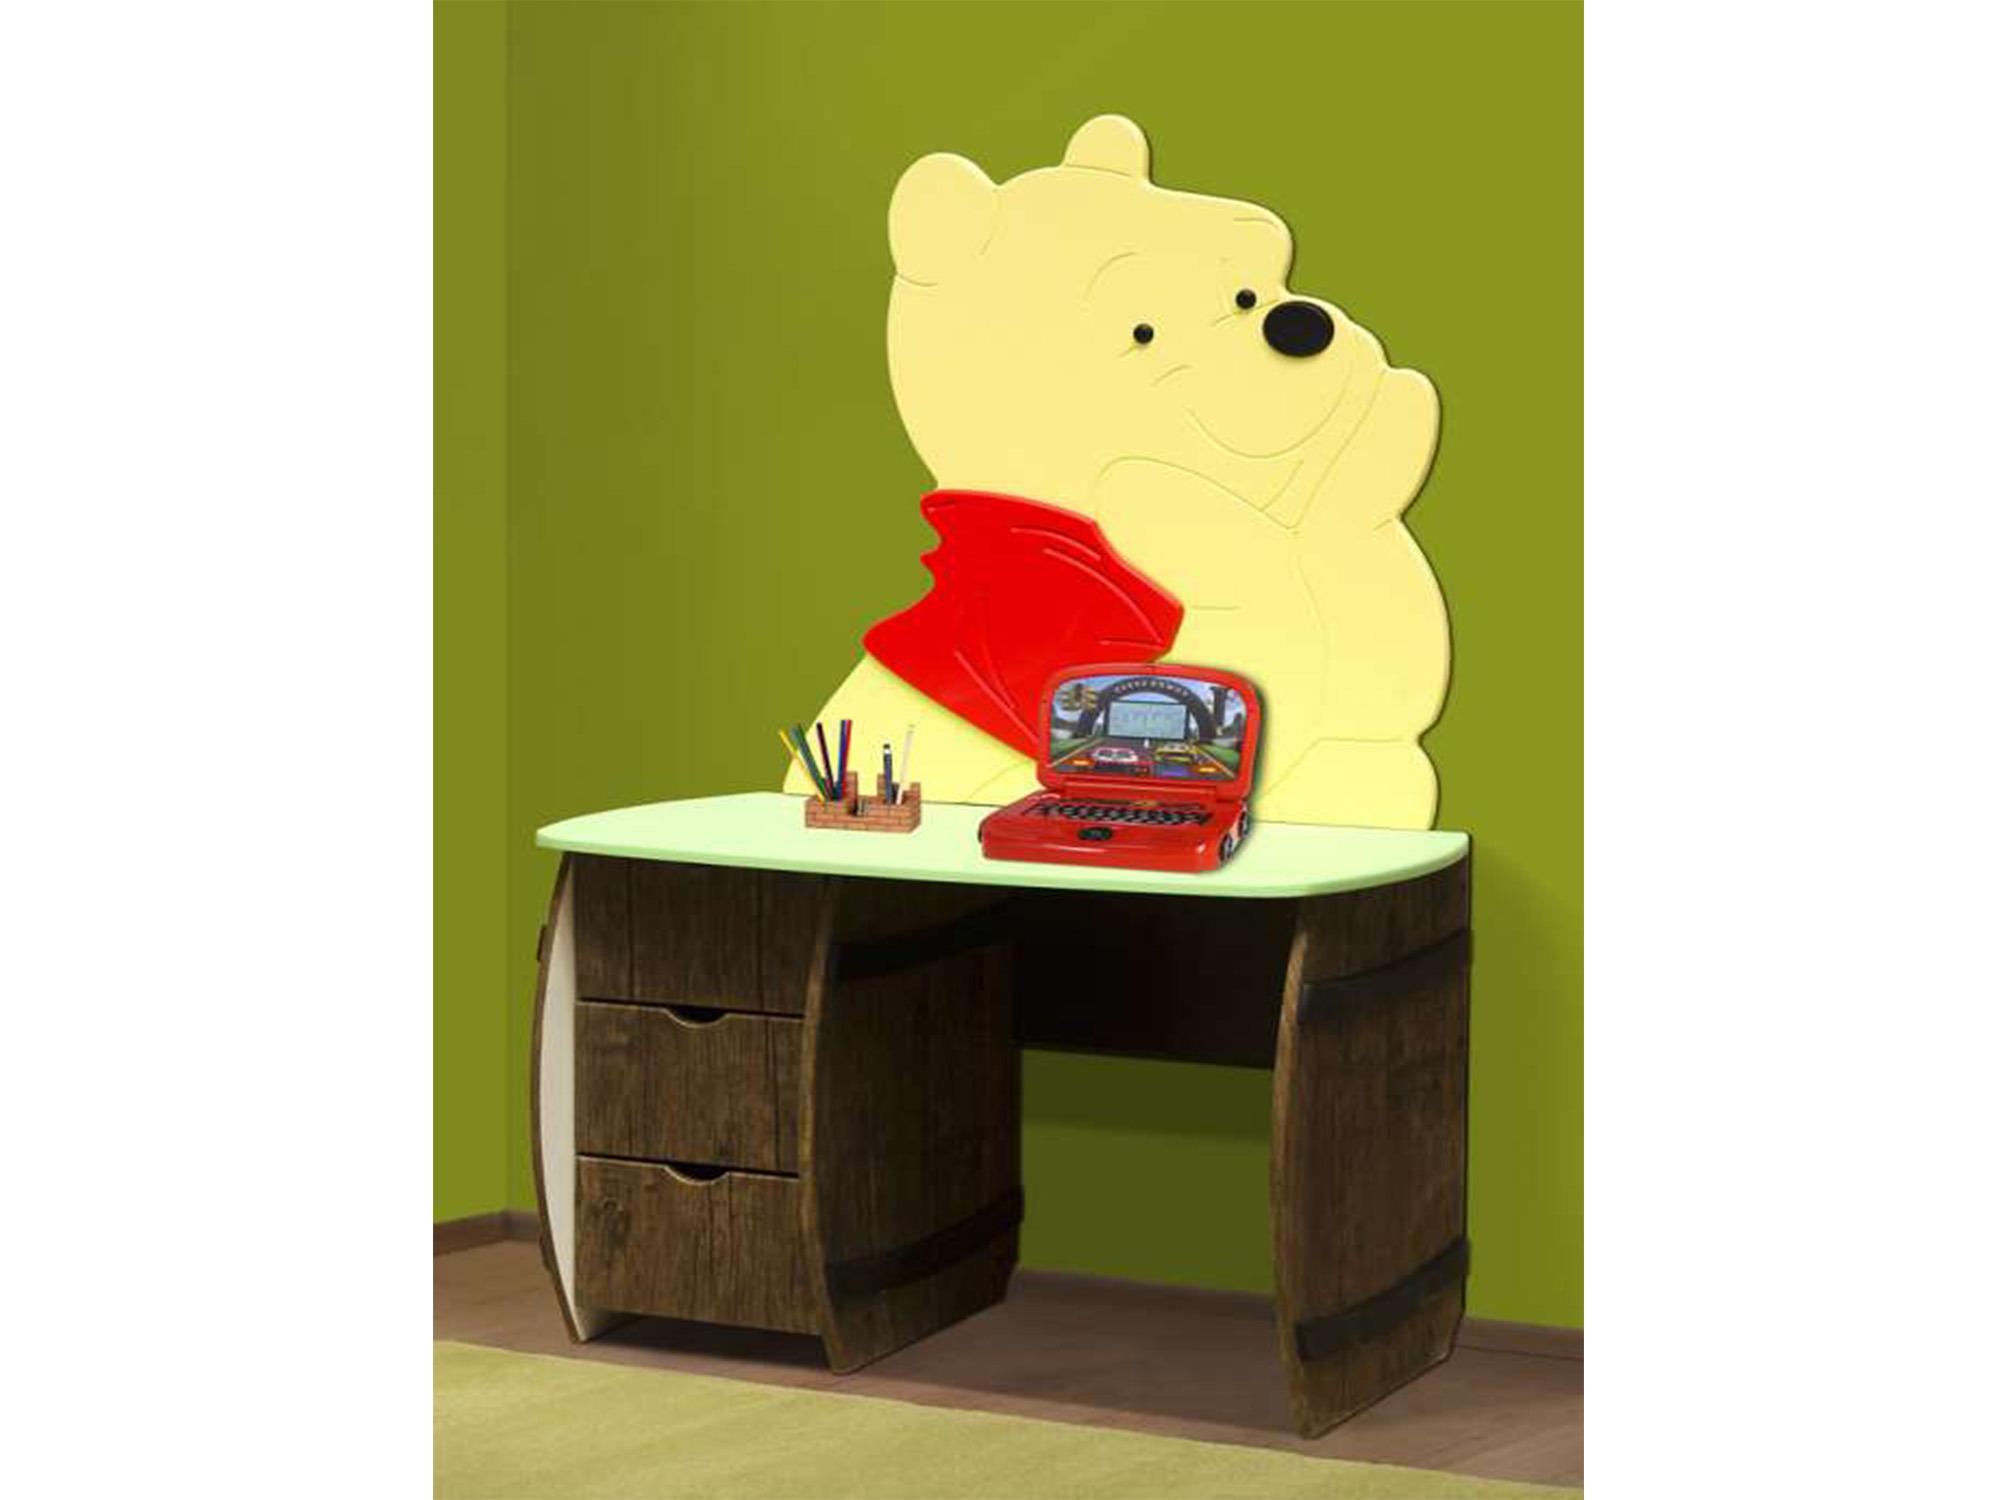 Стол письменный МедвежонокПисьменные столы<br><br><br>Длина мм: 1000<br>Высота мм: 670<br>Глубина мм: 550